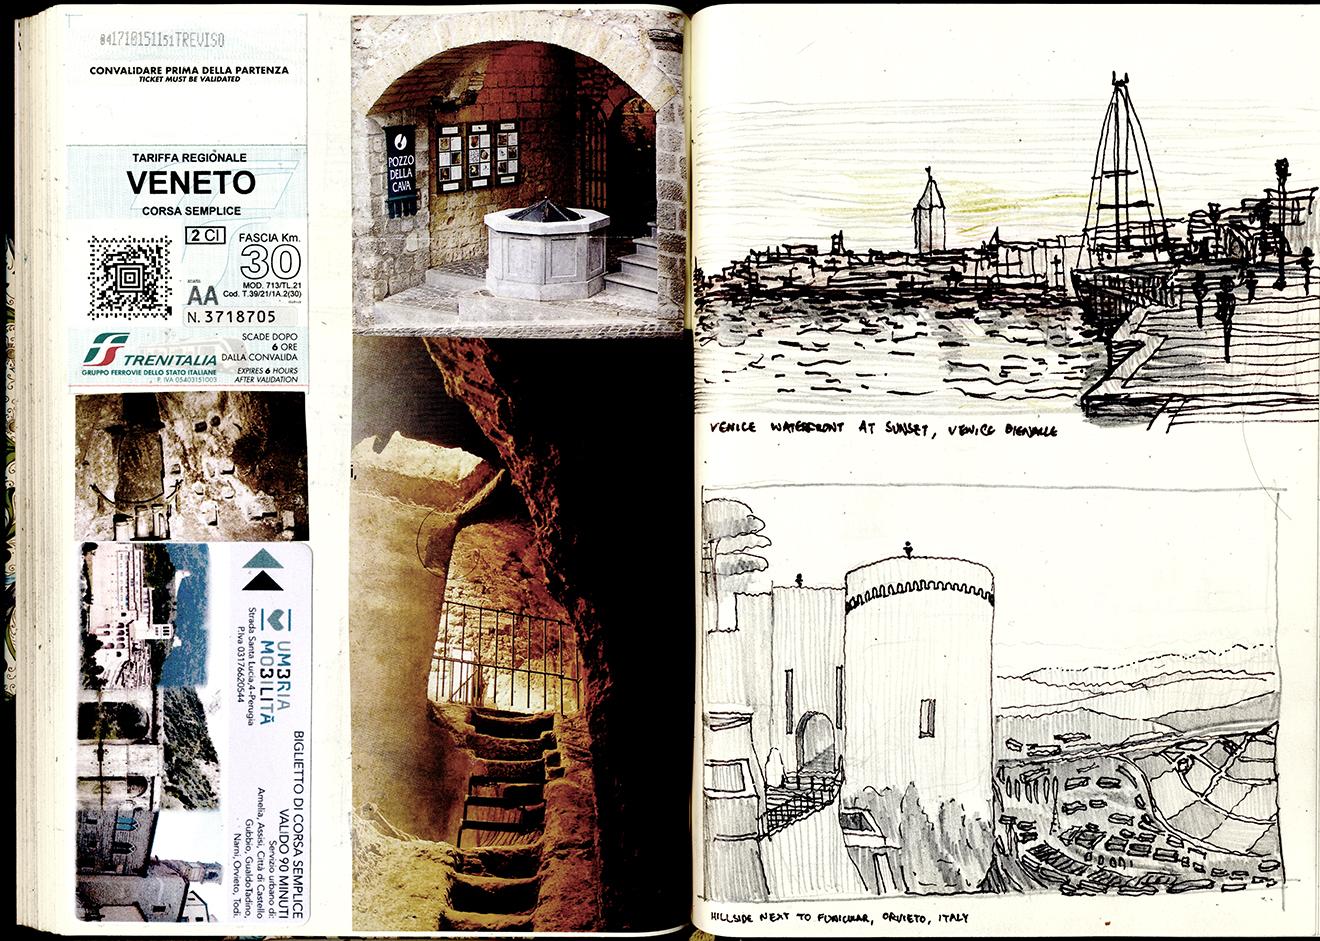 151115_Orvieto-views-colour_WEB.jpg